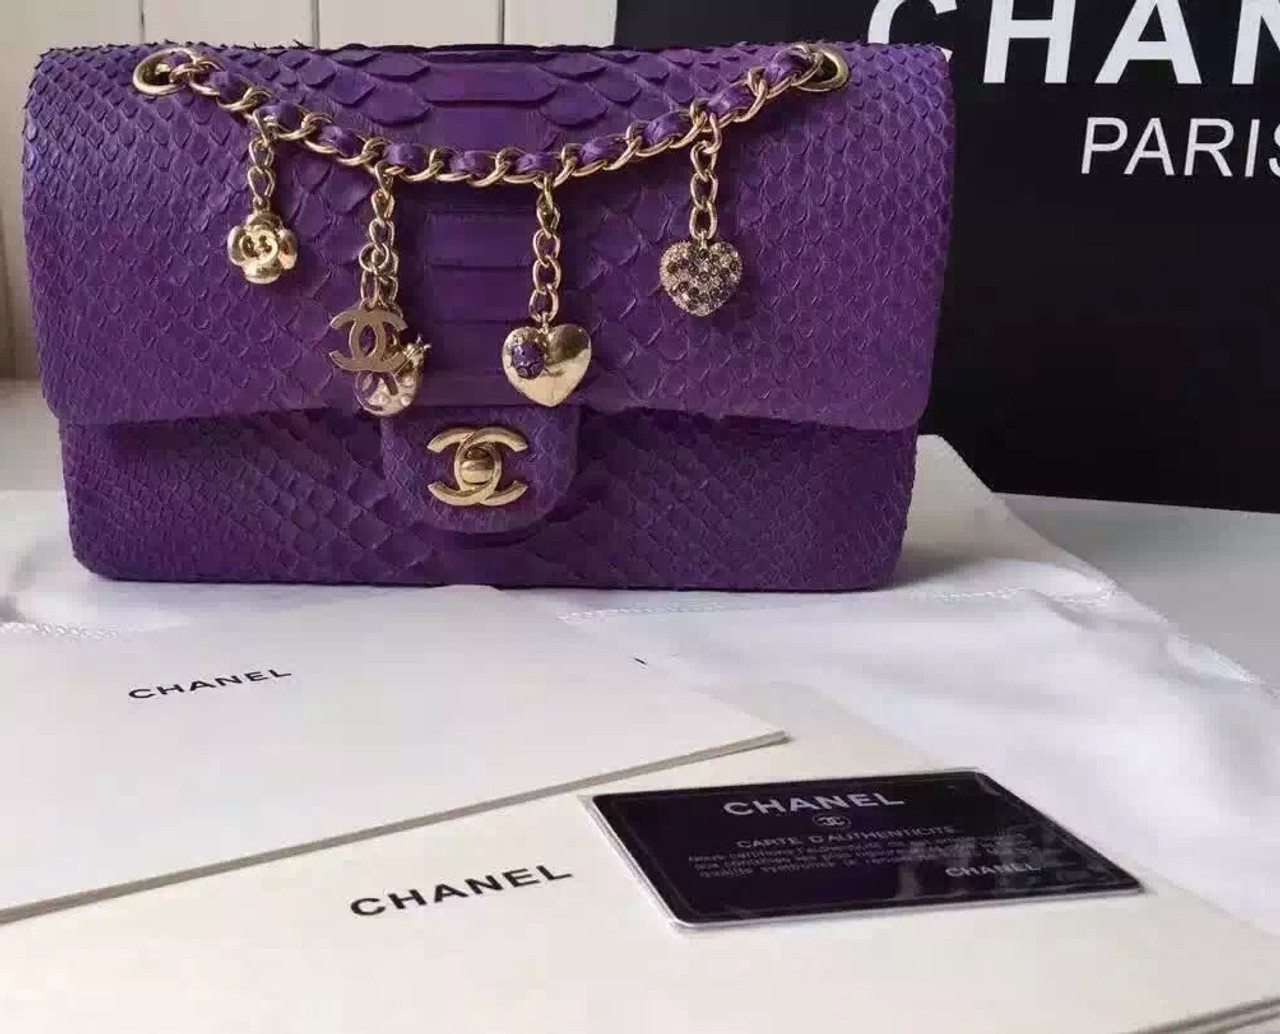 7f1ebcf26035 CHANEL Classic Flap Bag PYTHON Purple with charms - Bella Vita Moda